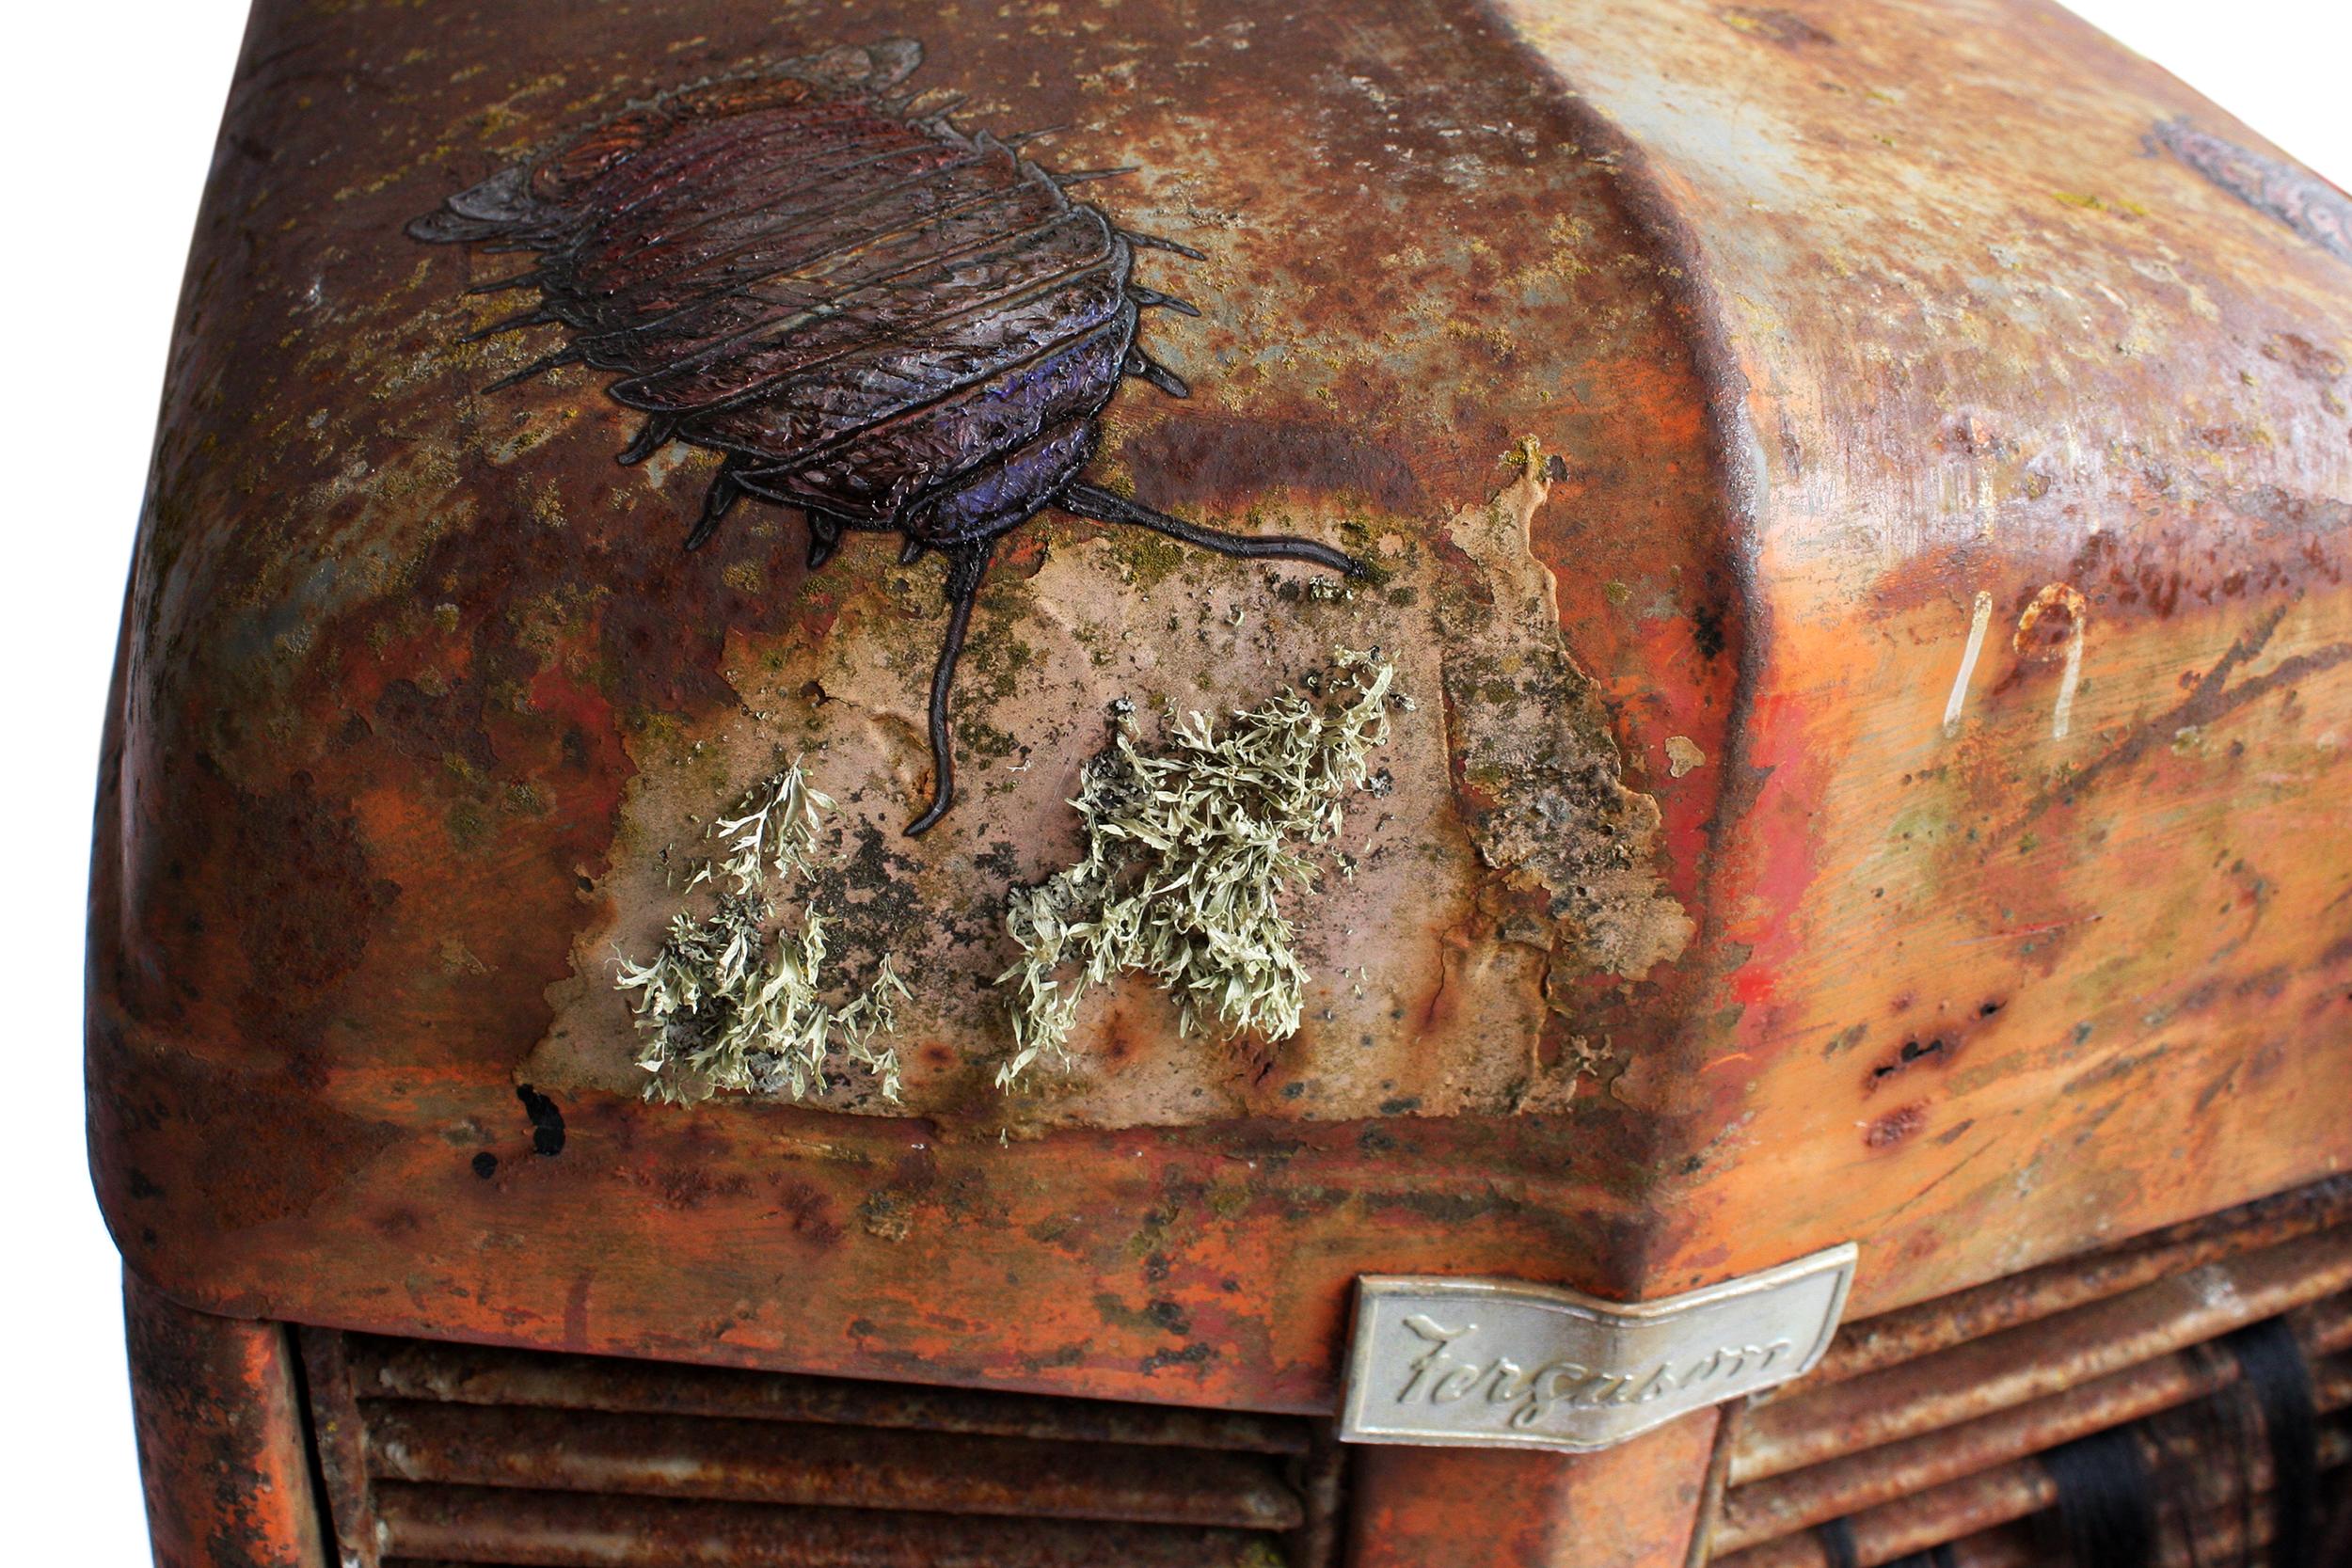 giant isopods crawling over Massey Ferguson tractor bonnet